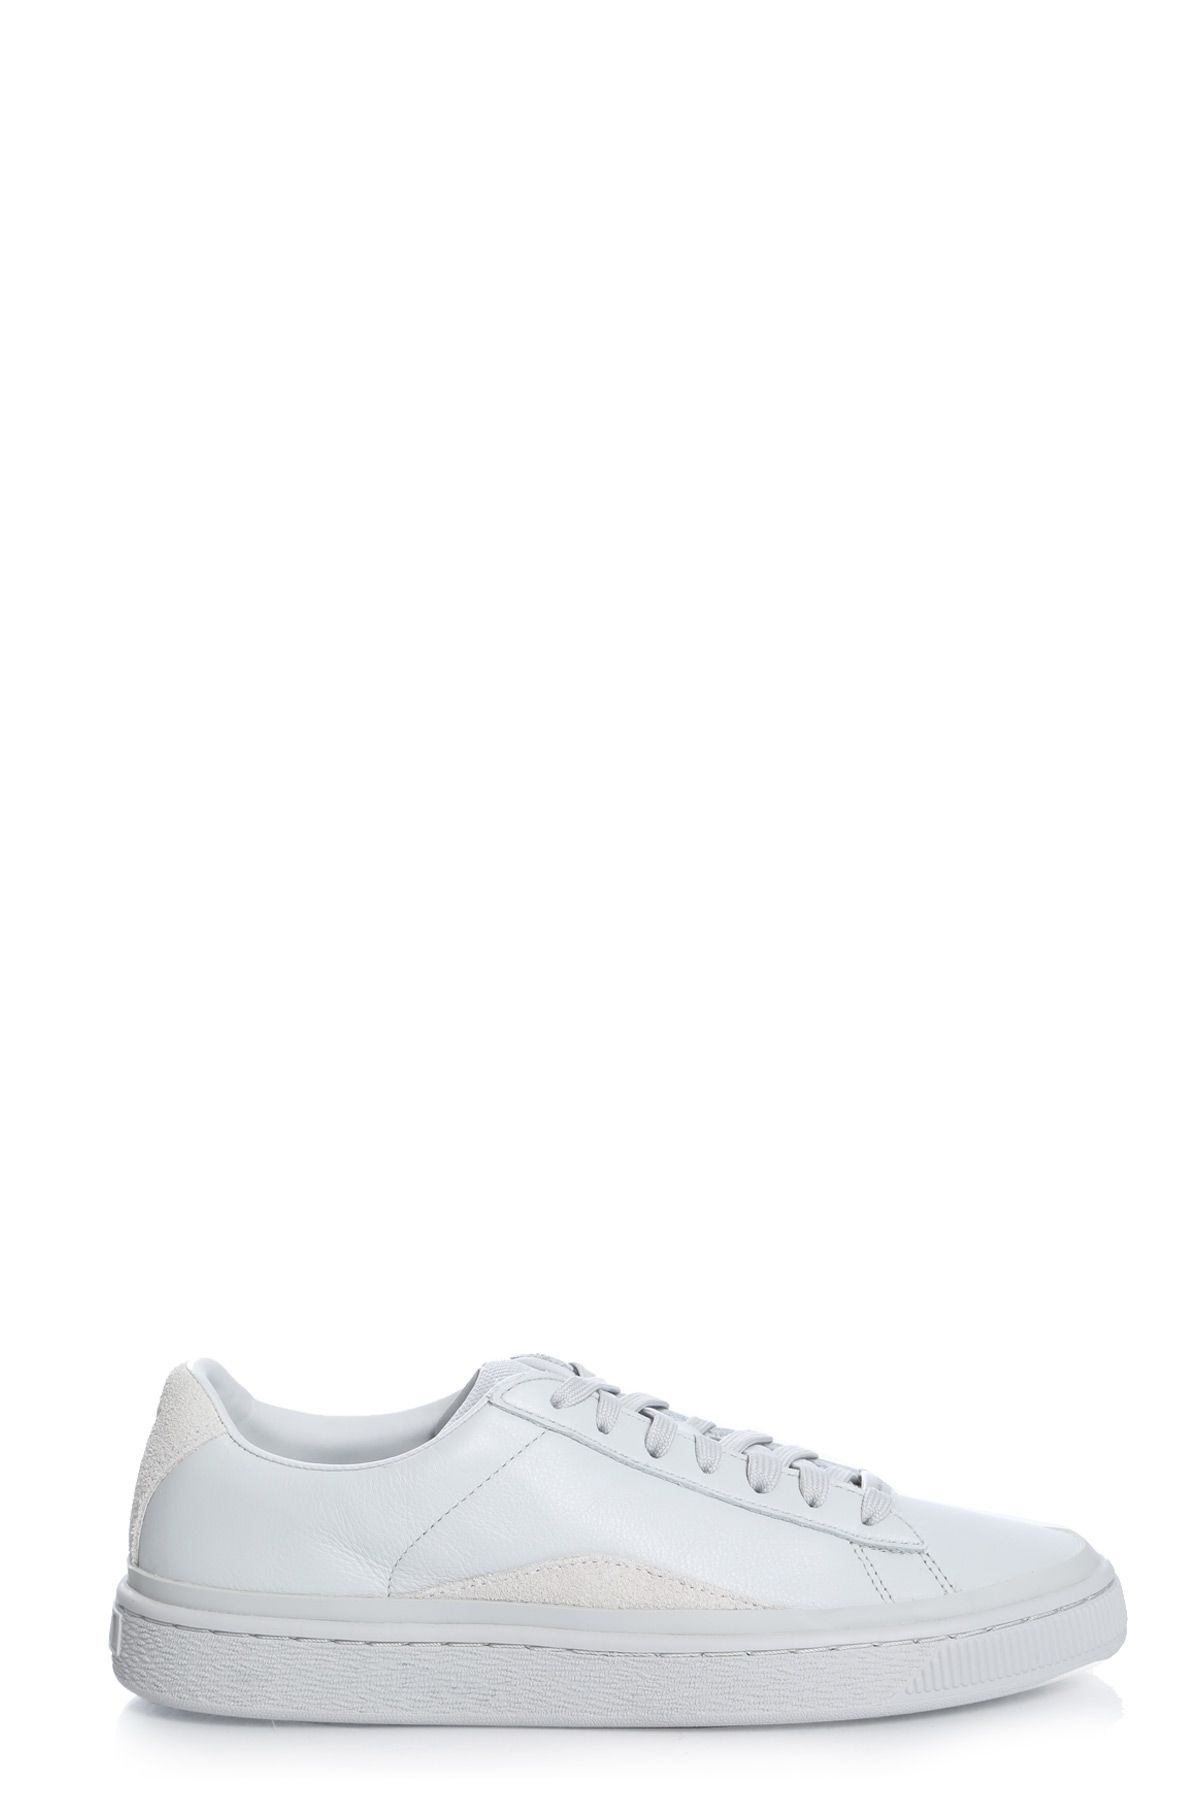 PUMA X HAN KJOBENHAVN Sneakers in Grigio/Bianco